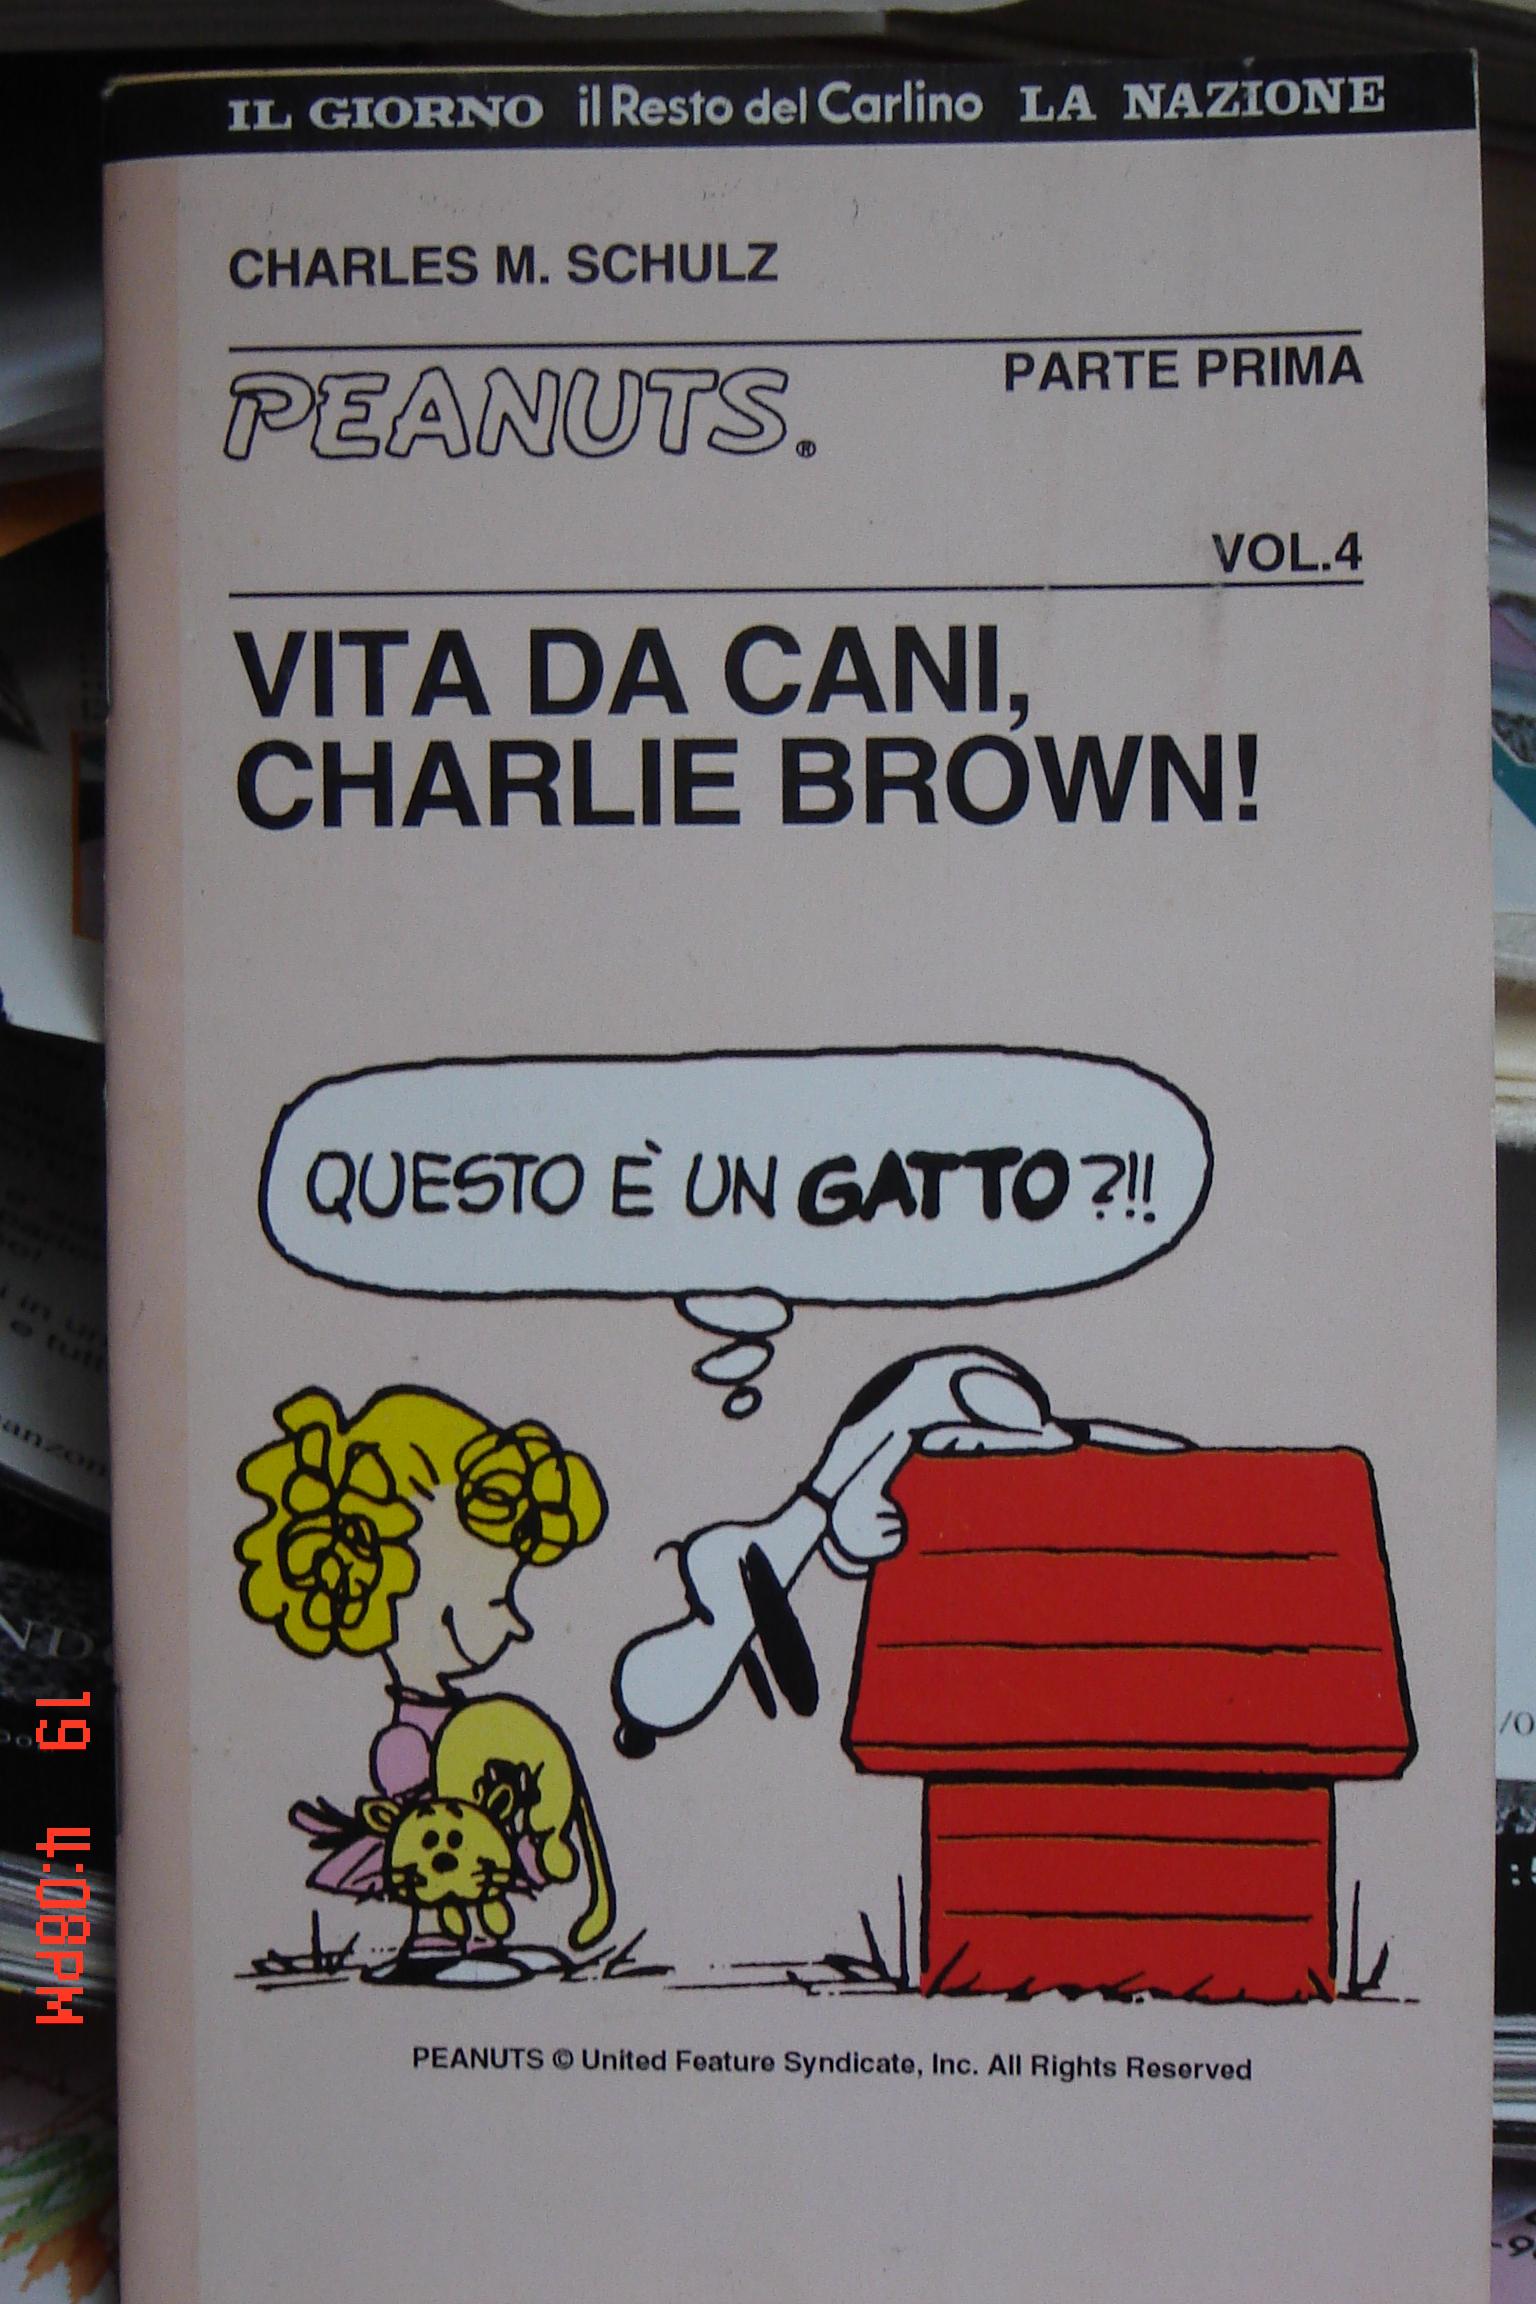 Vita da cani, Charlie Brown! Vol. 1